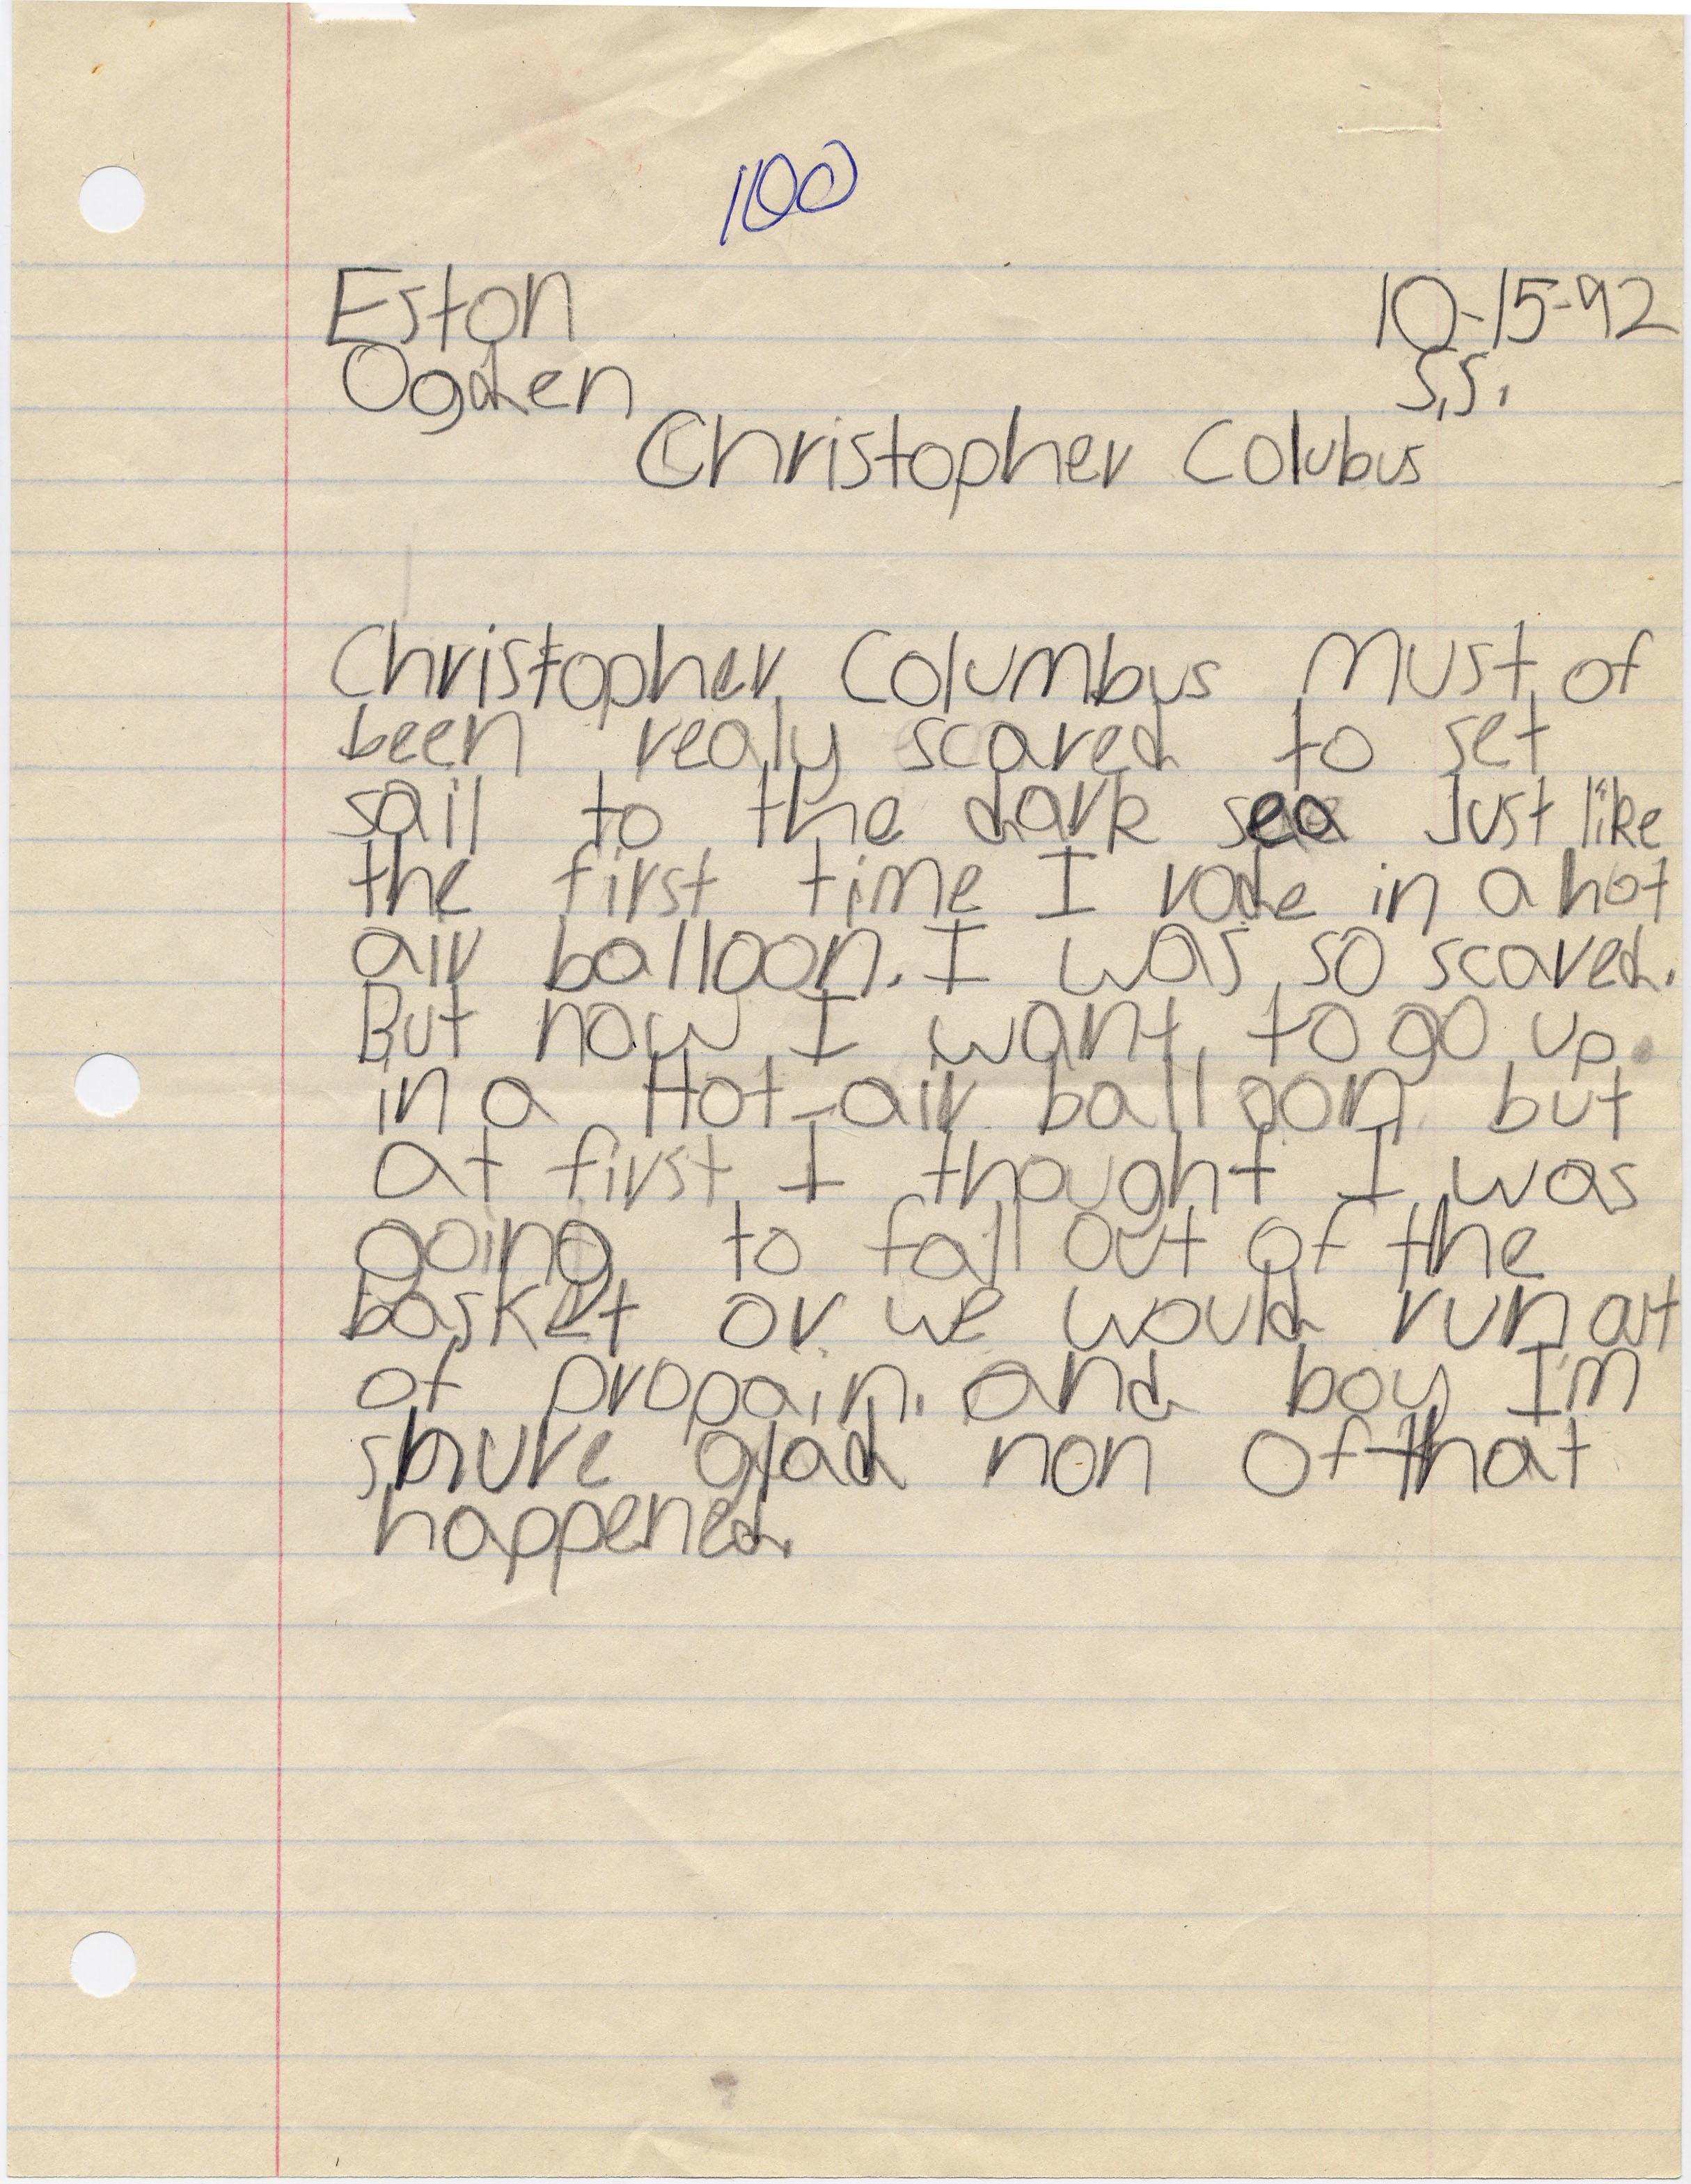 by Eston Betts Age 7